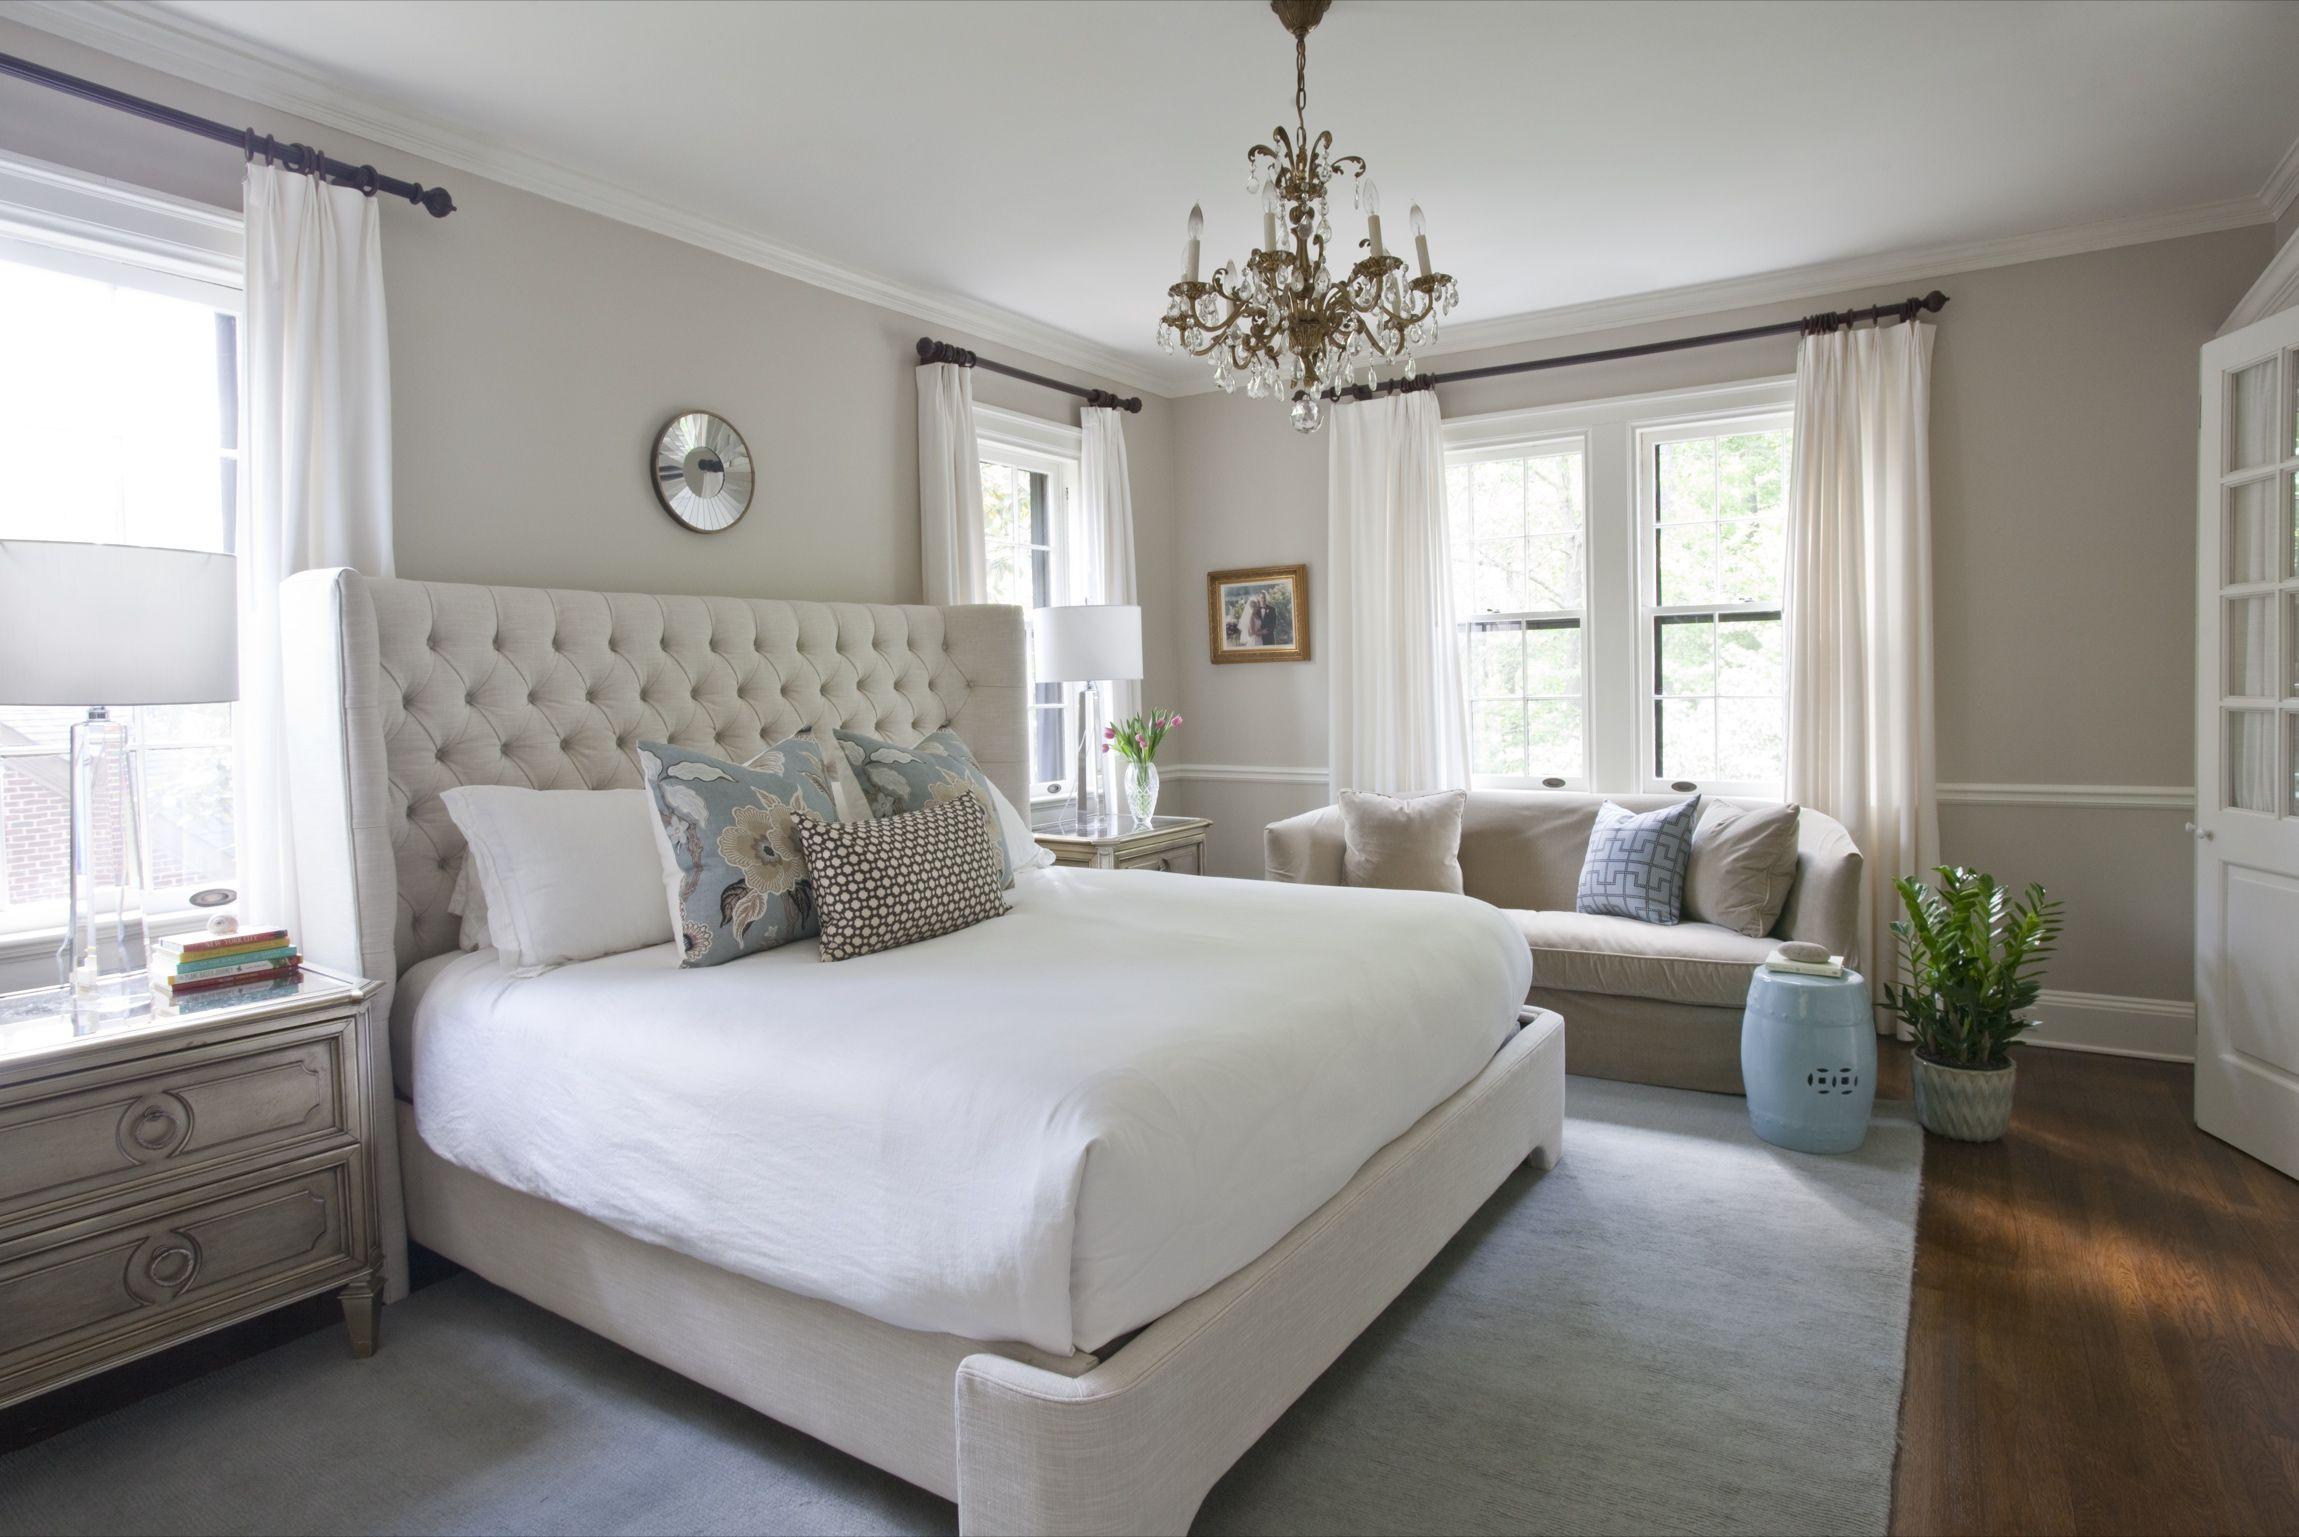 erika ward interiors atlanta: interior design, interior decorating